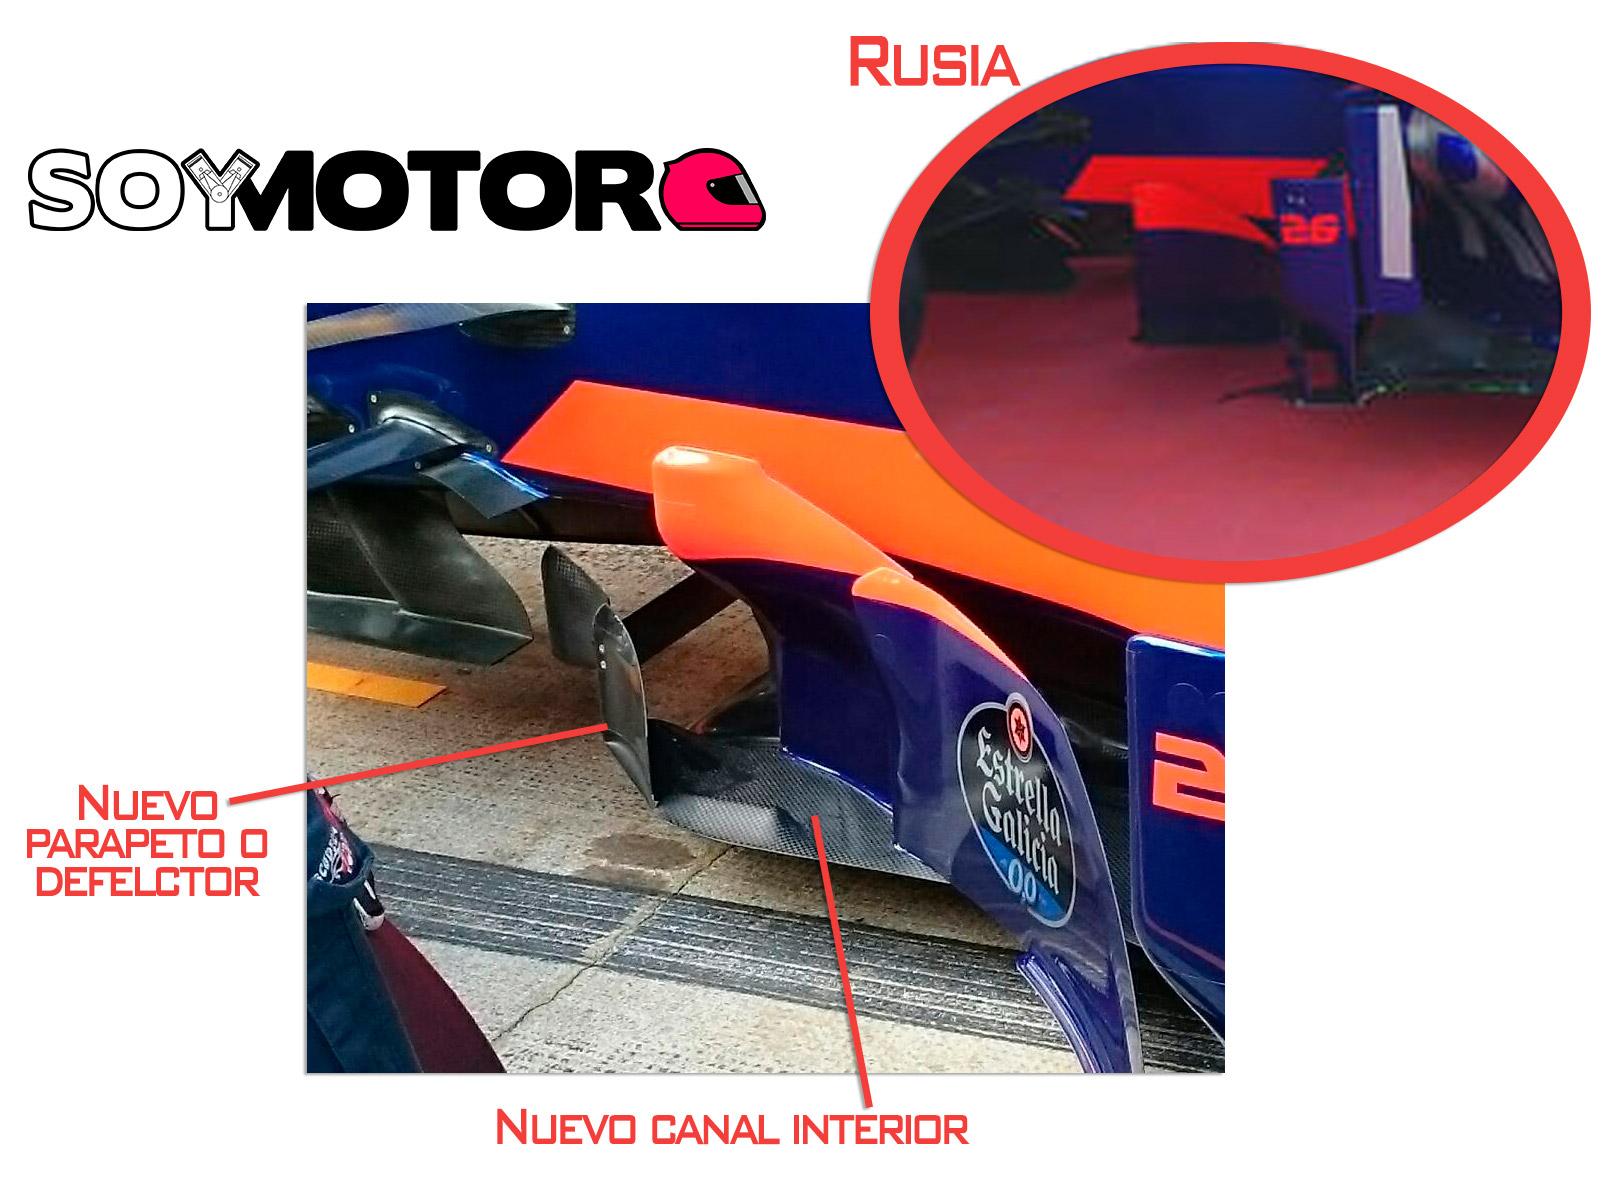 12-toro-rosso-nuevo-bargeboard.jpg